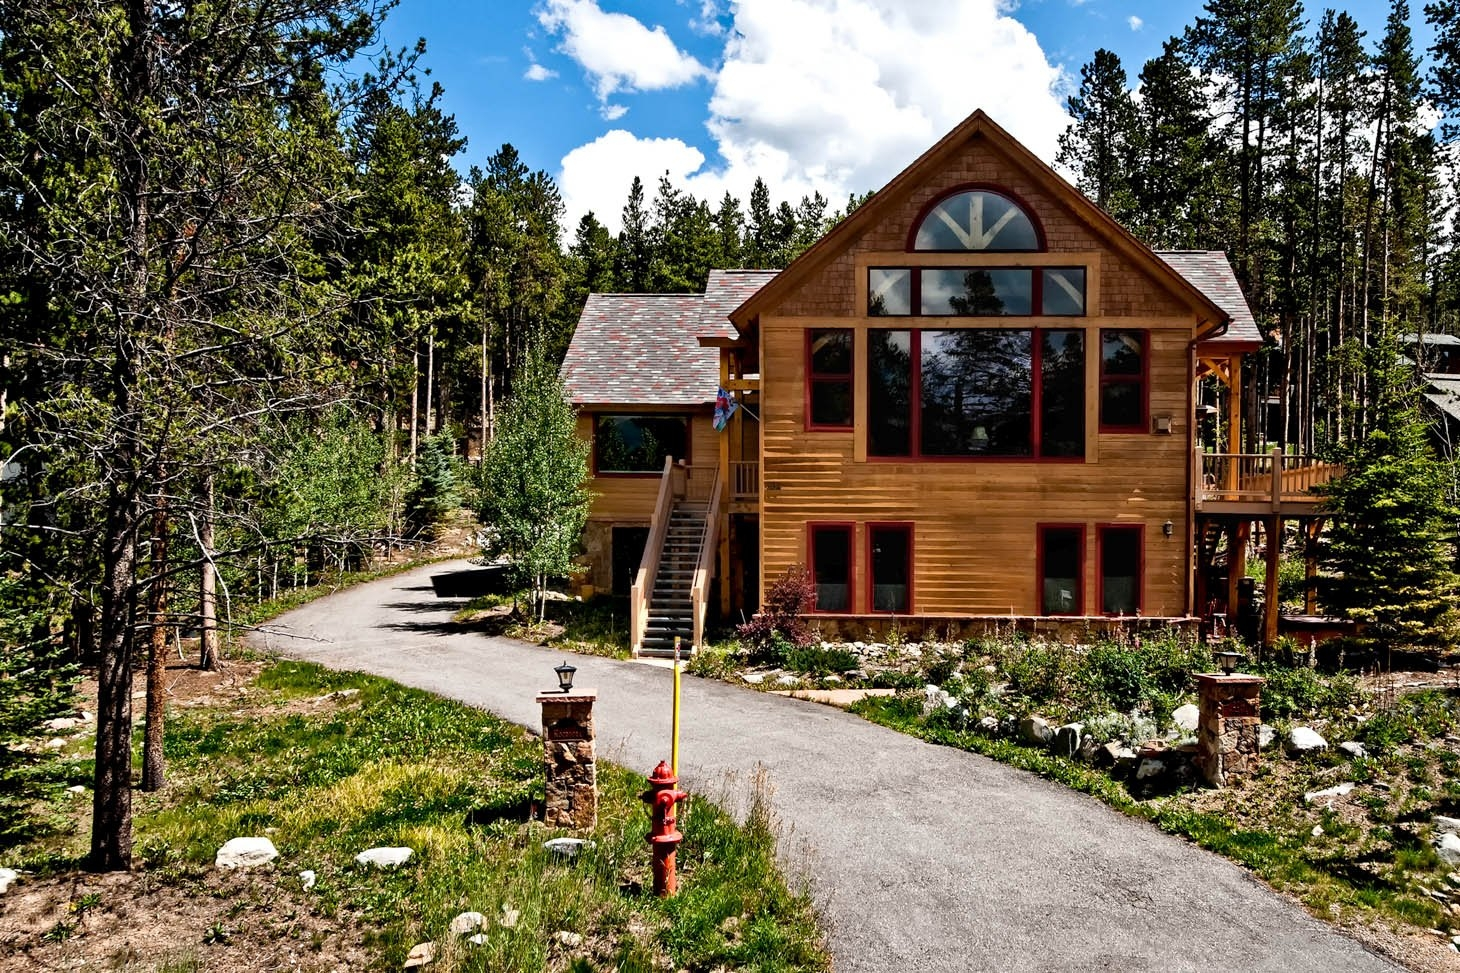 204 South Pine Street Breckenridge Colorado 80424